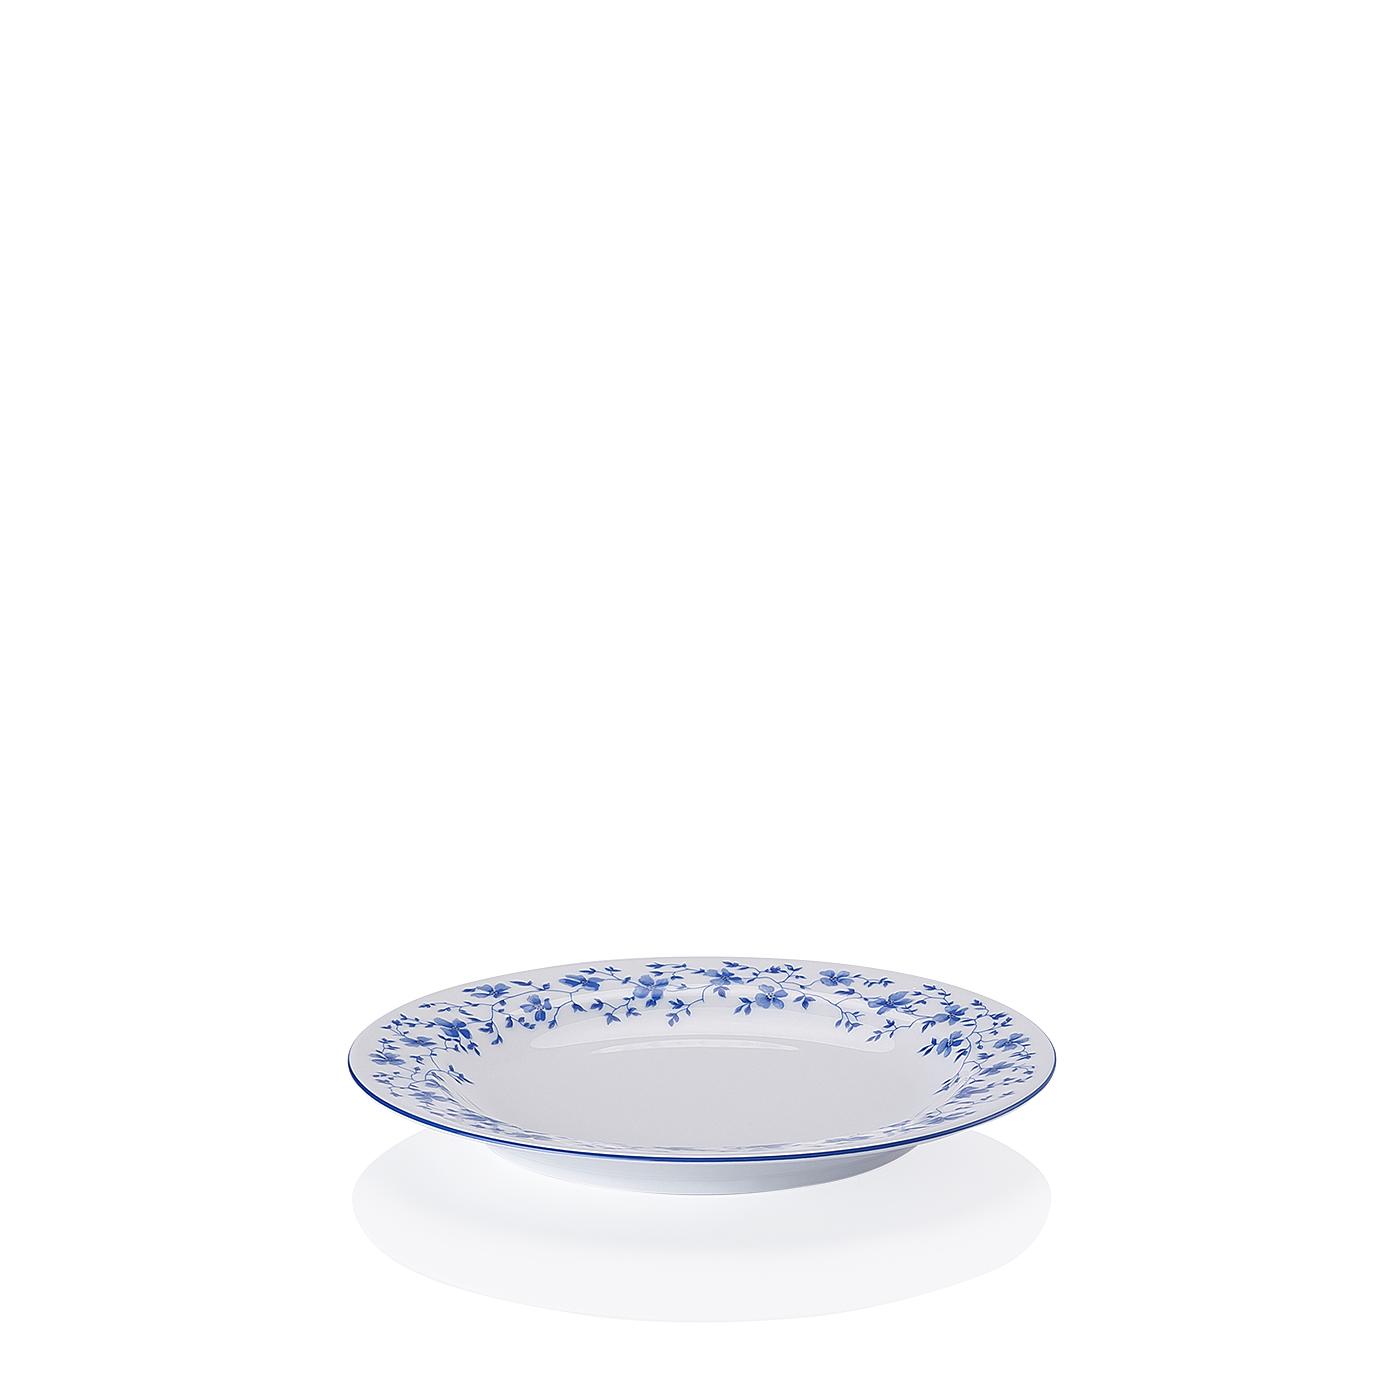 Frühstücksteller 19 cm/Fa Form 1382 Blaublüten Arzberg